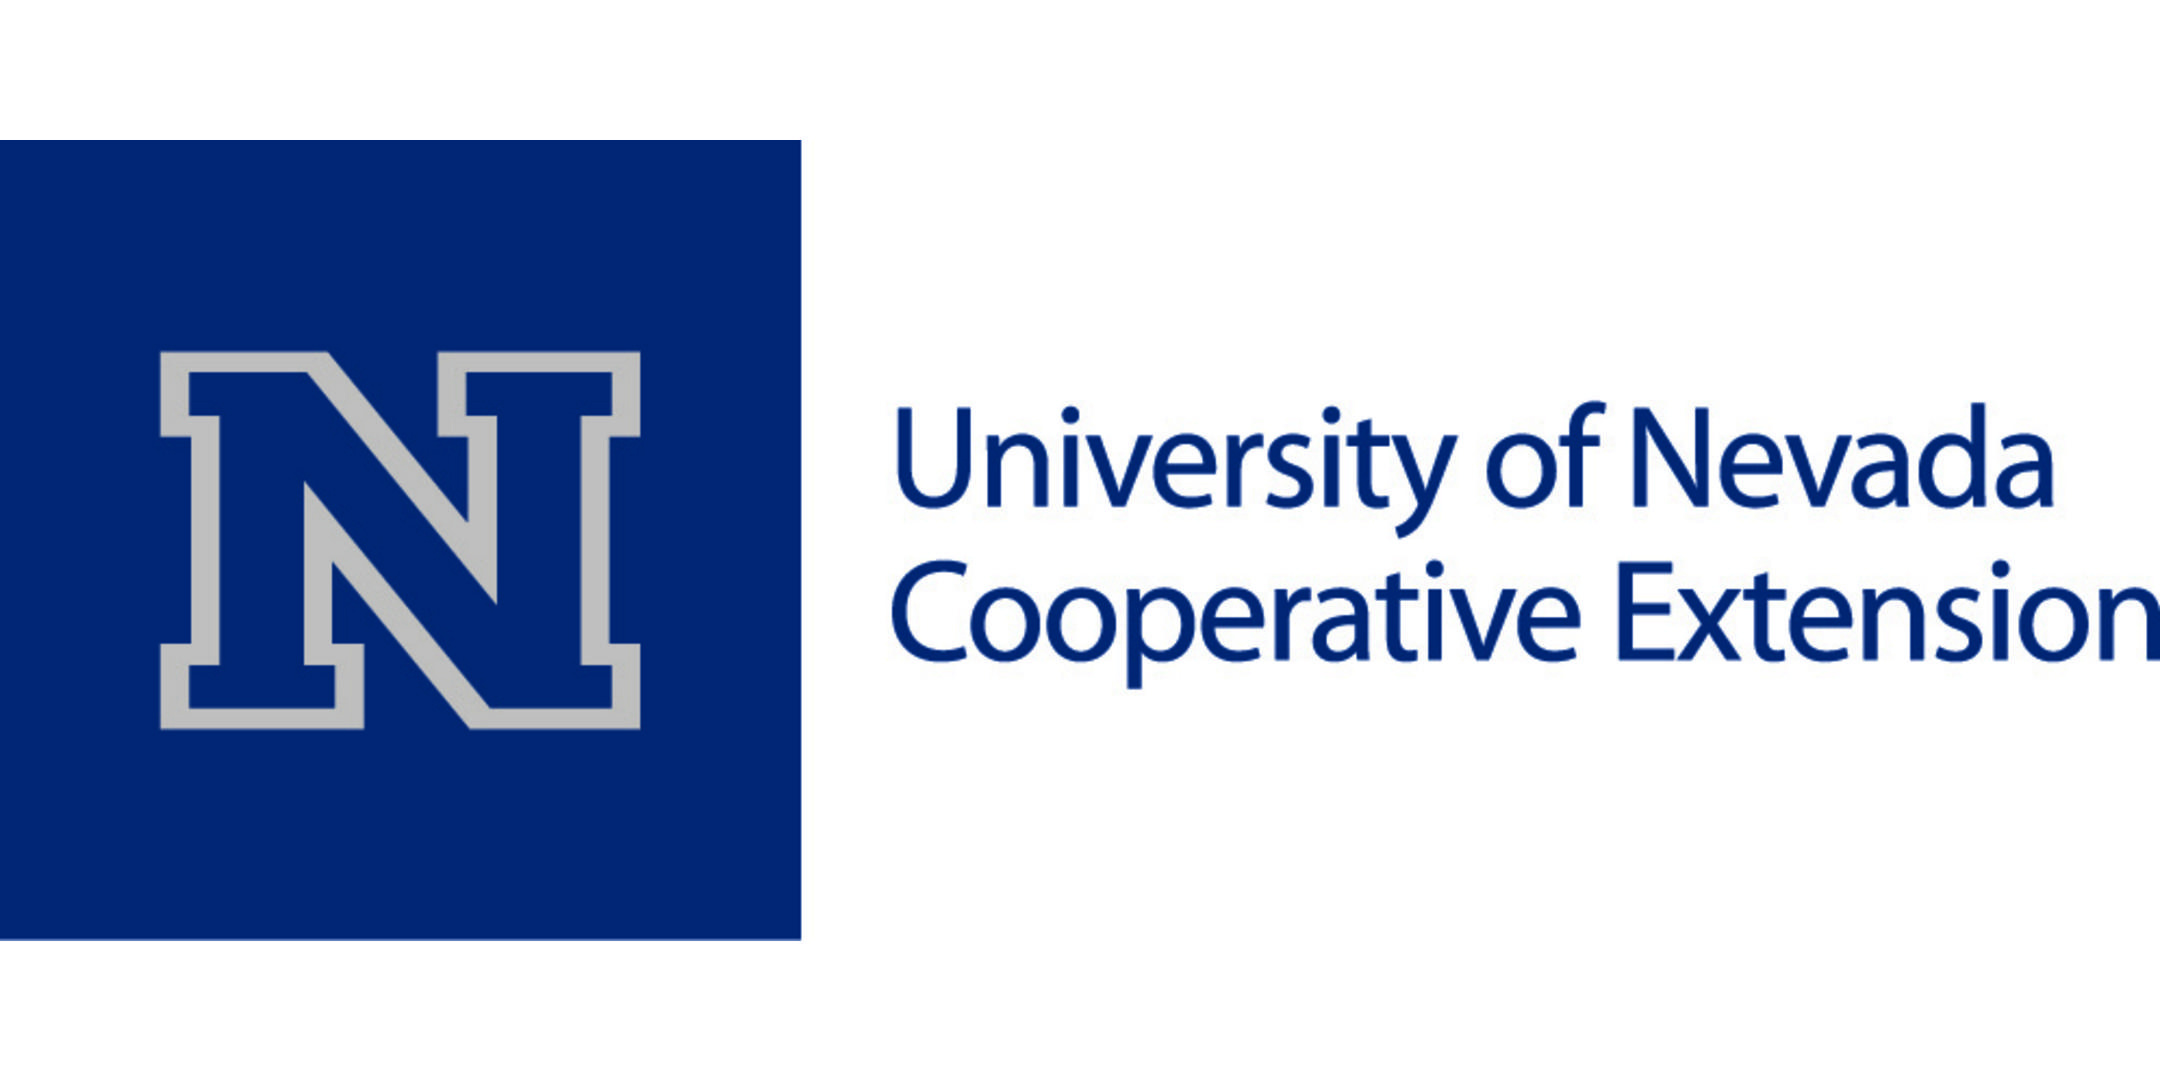 University of Nevada Cooperative Extension